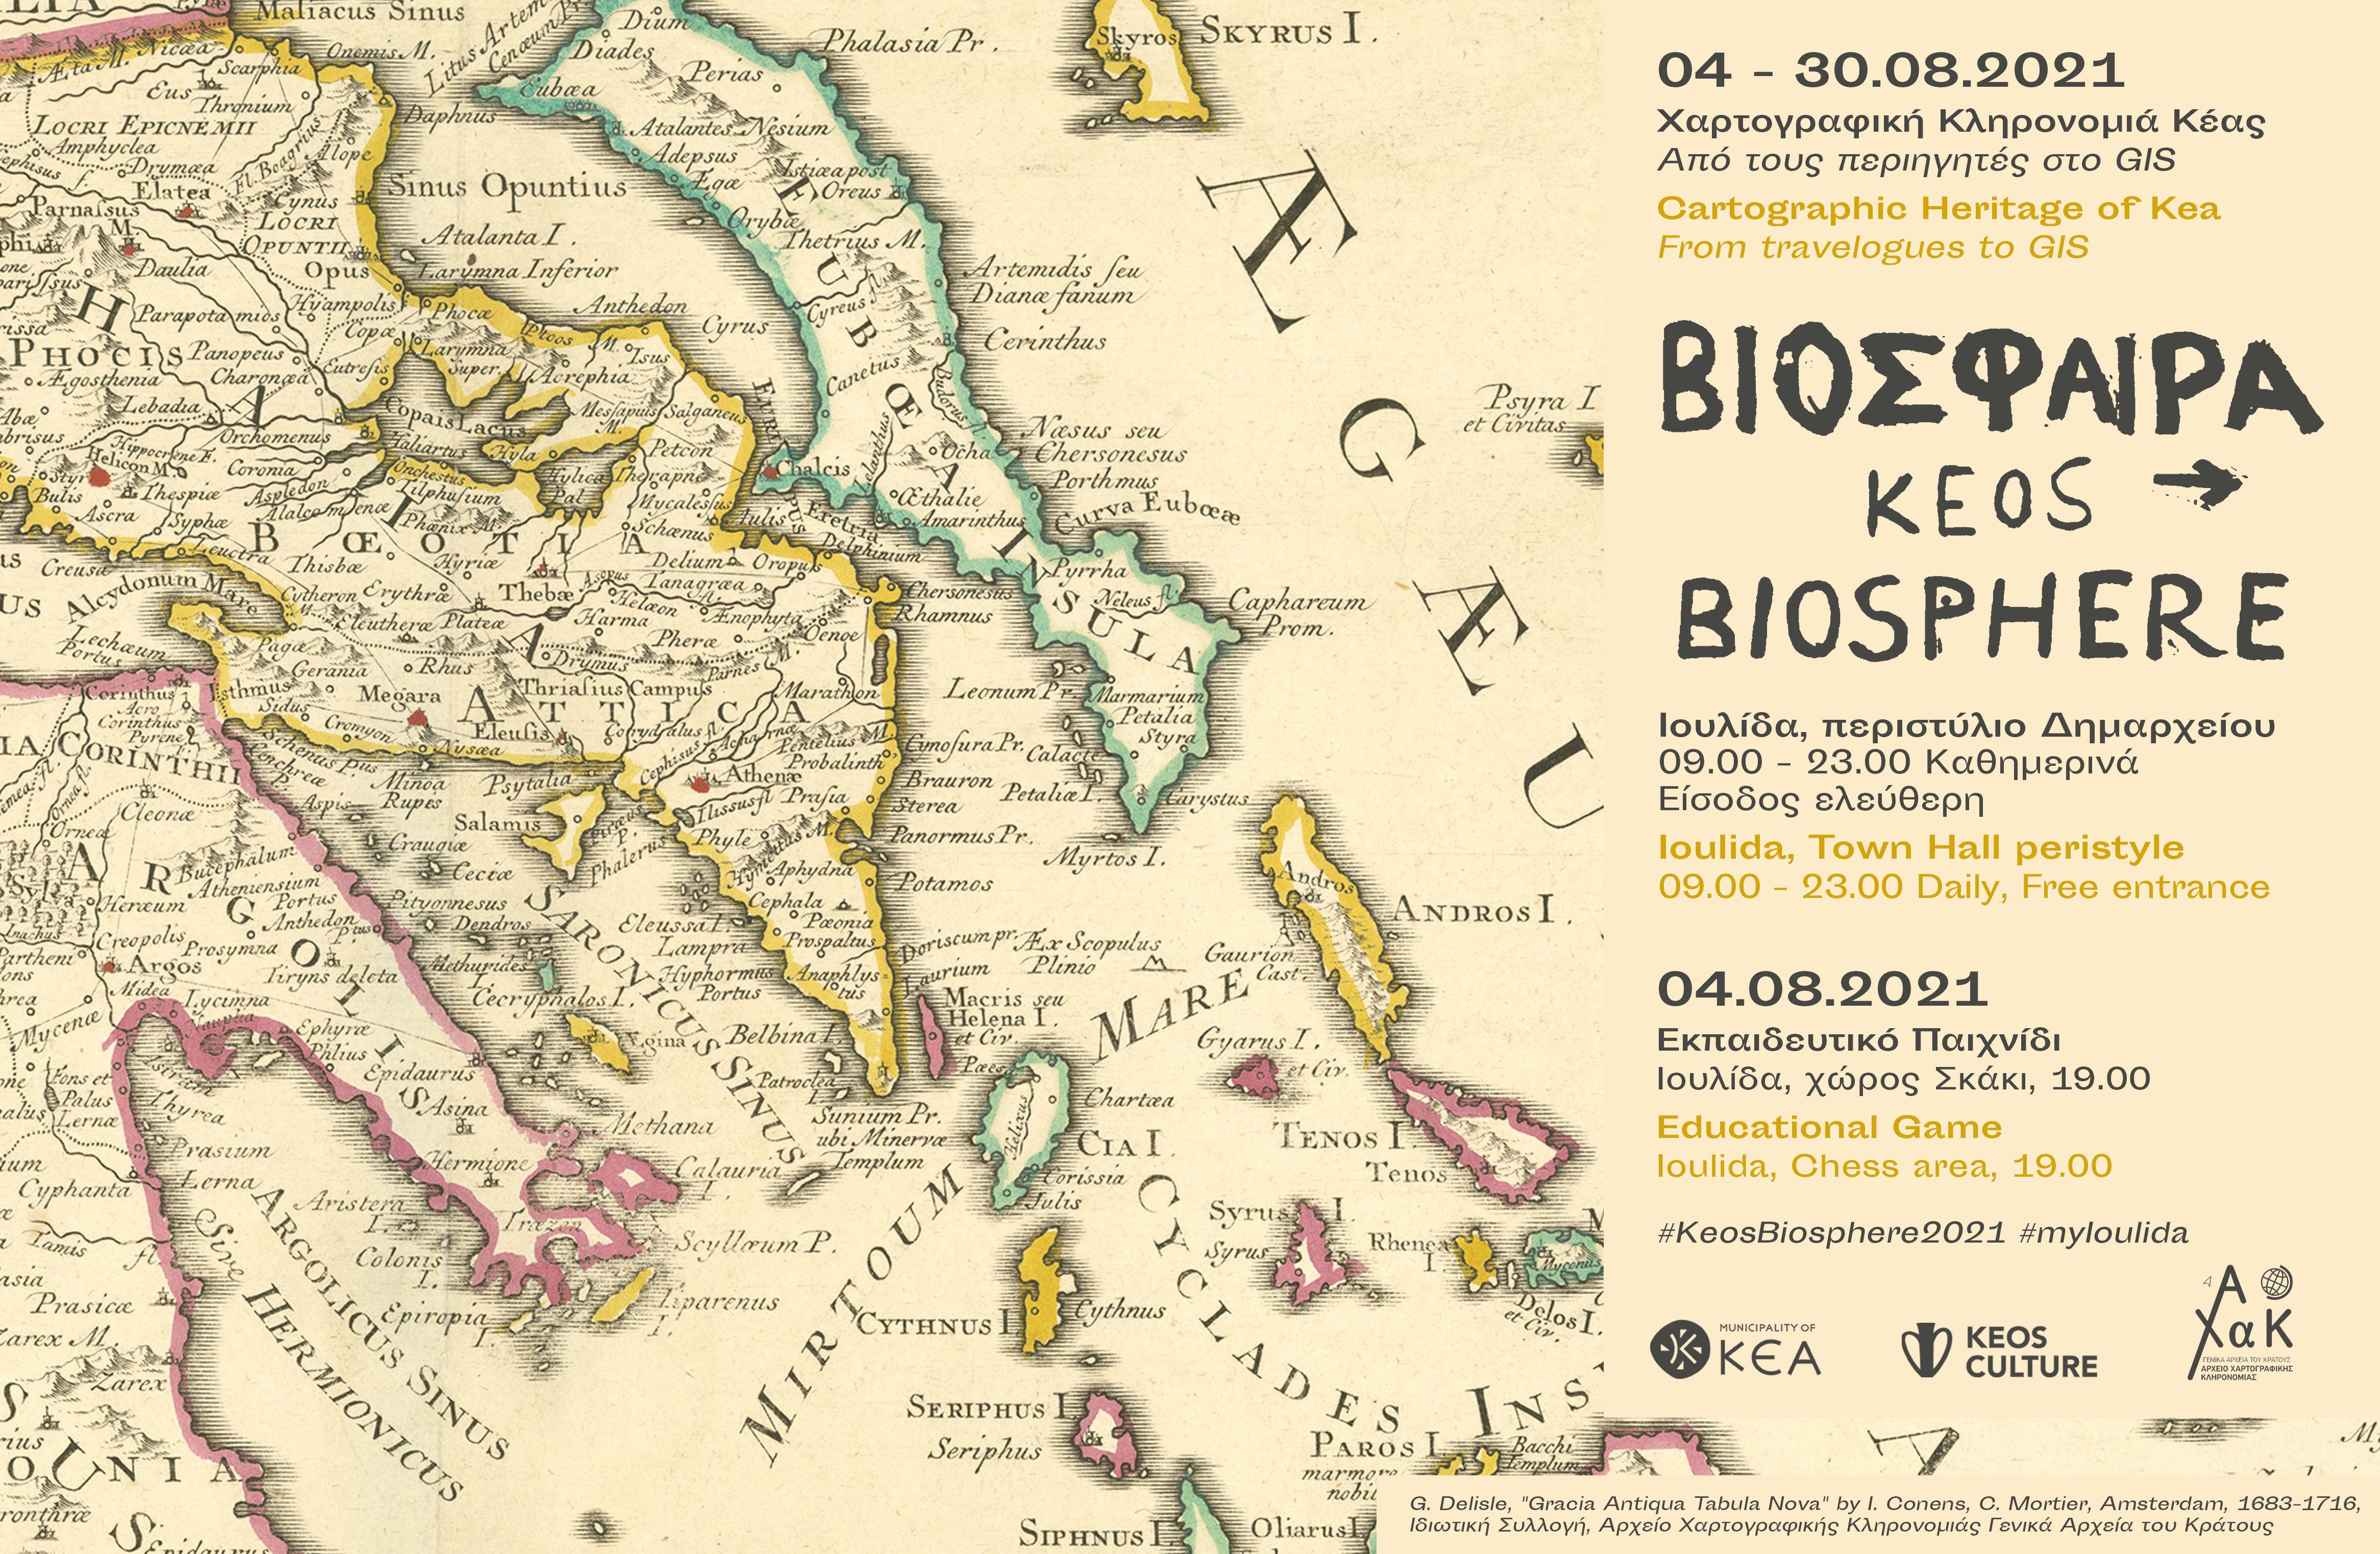 web banner biosphere keos 2021